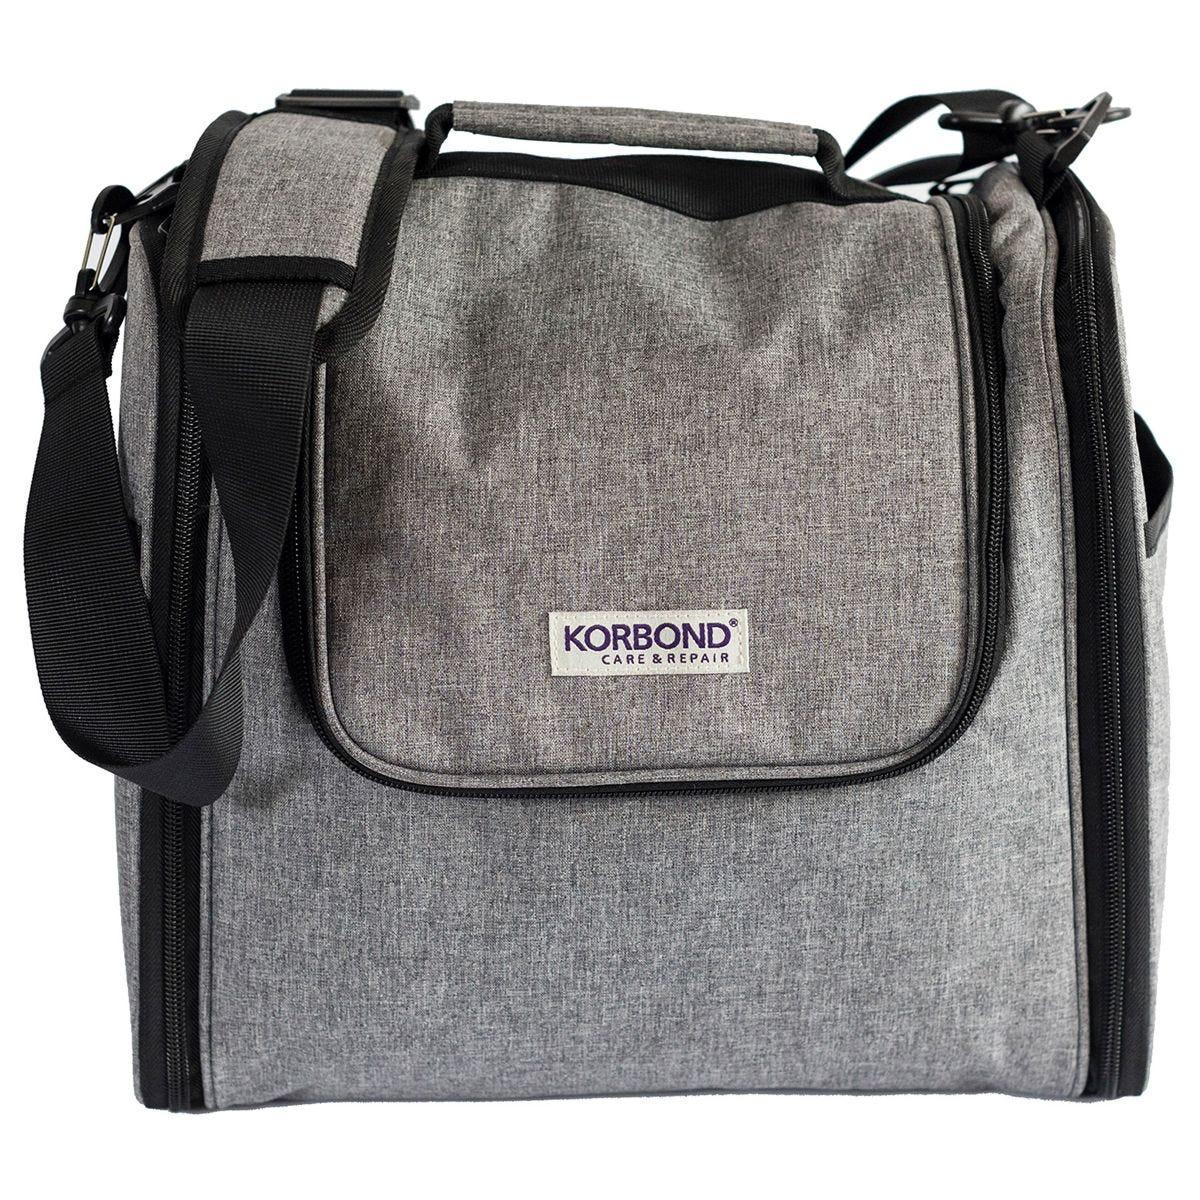 Korbond Yarn Storage Bag - Grey